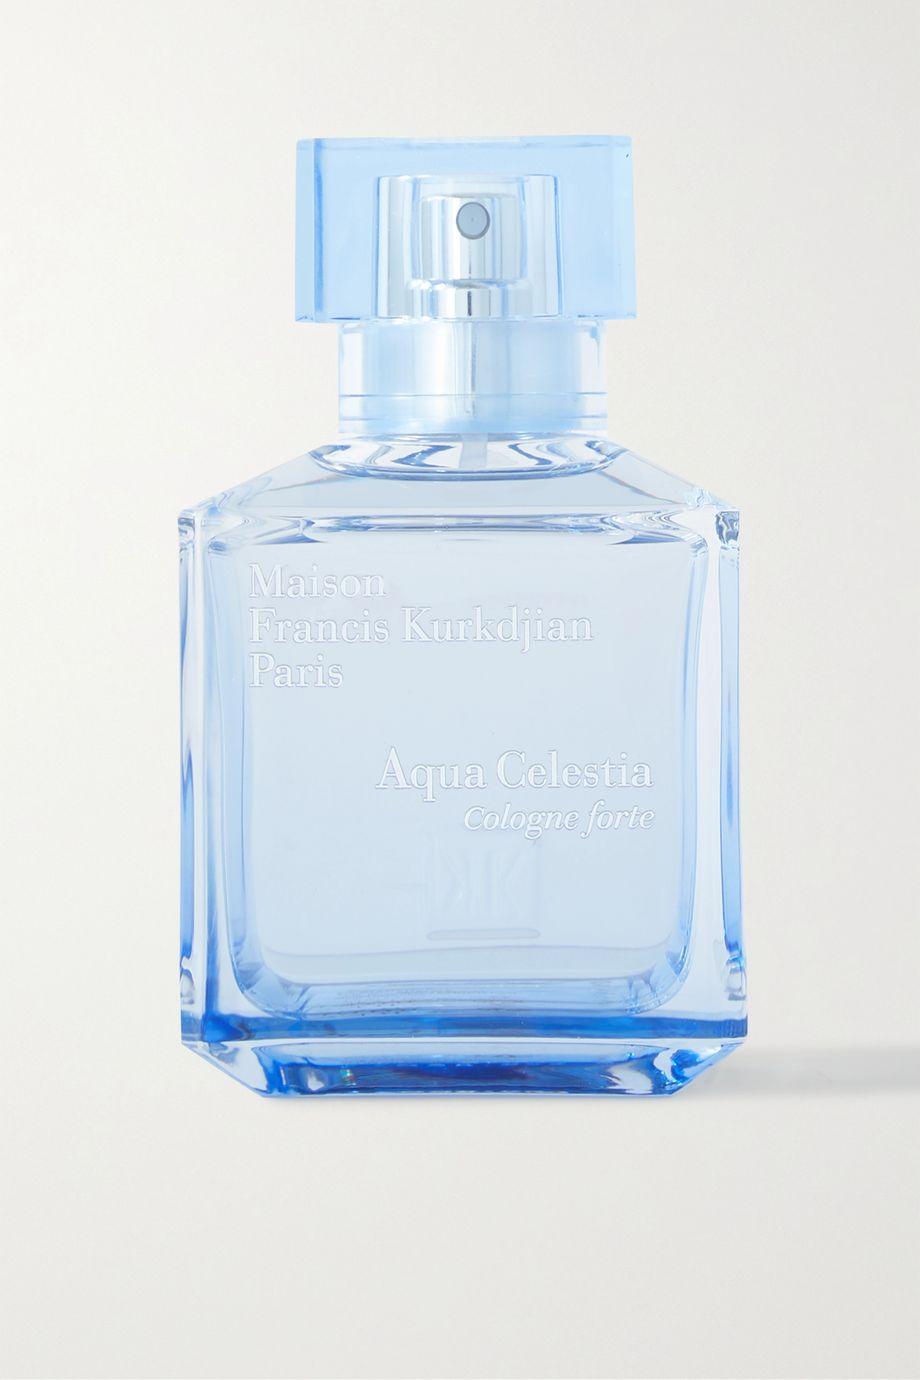 Maison Francis Kurkdjian Eau de Parfum - Aqua Celestia Forte, 70ml